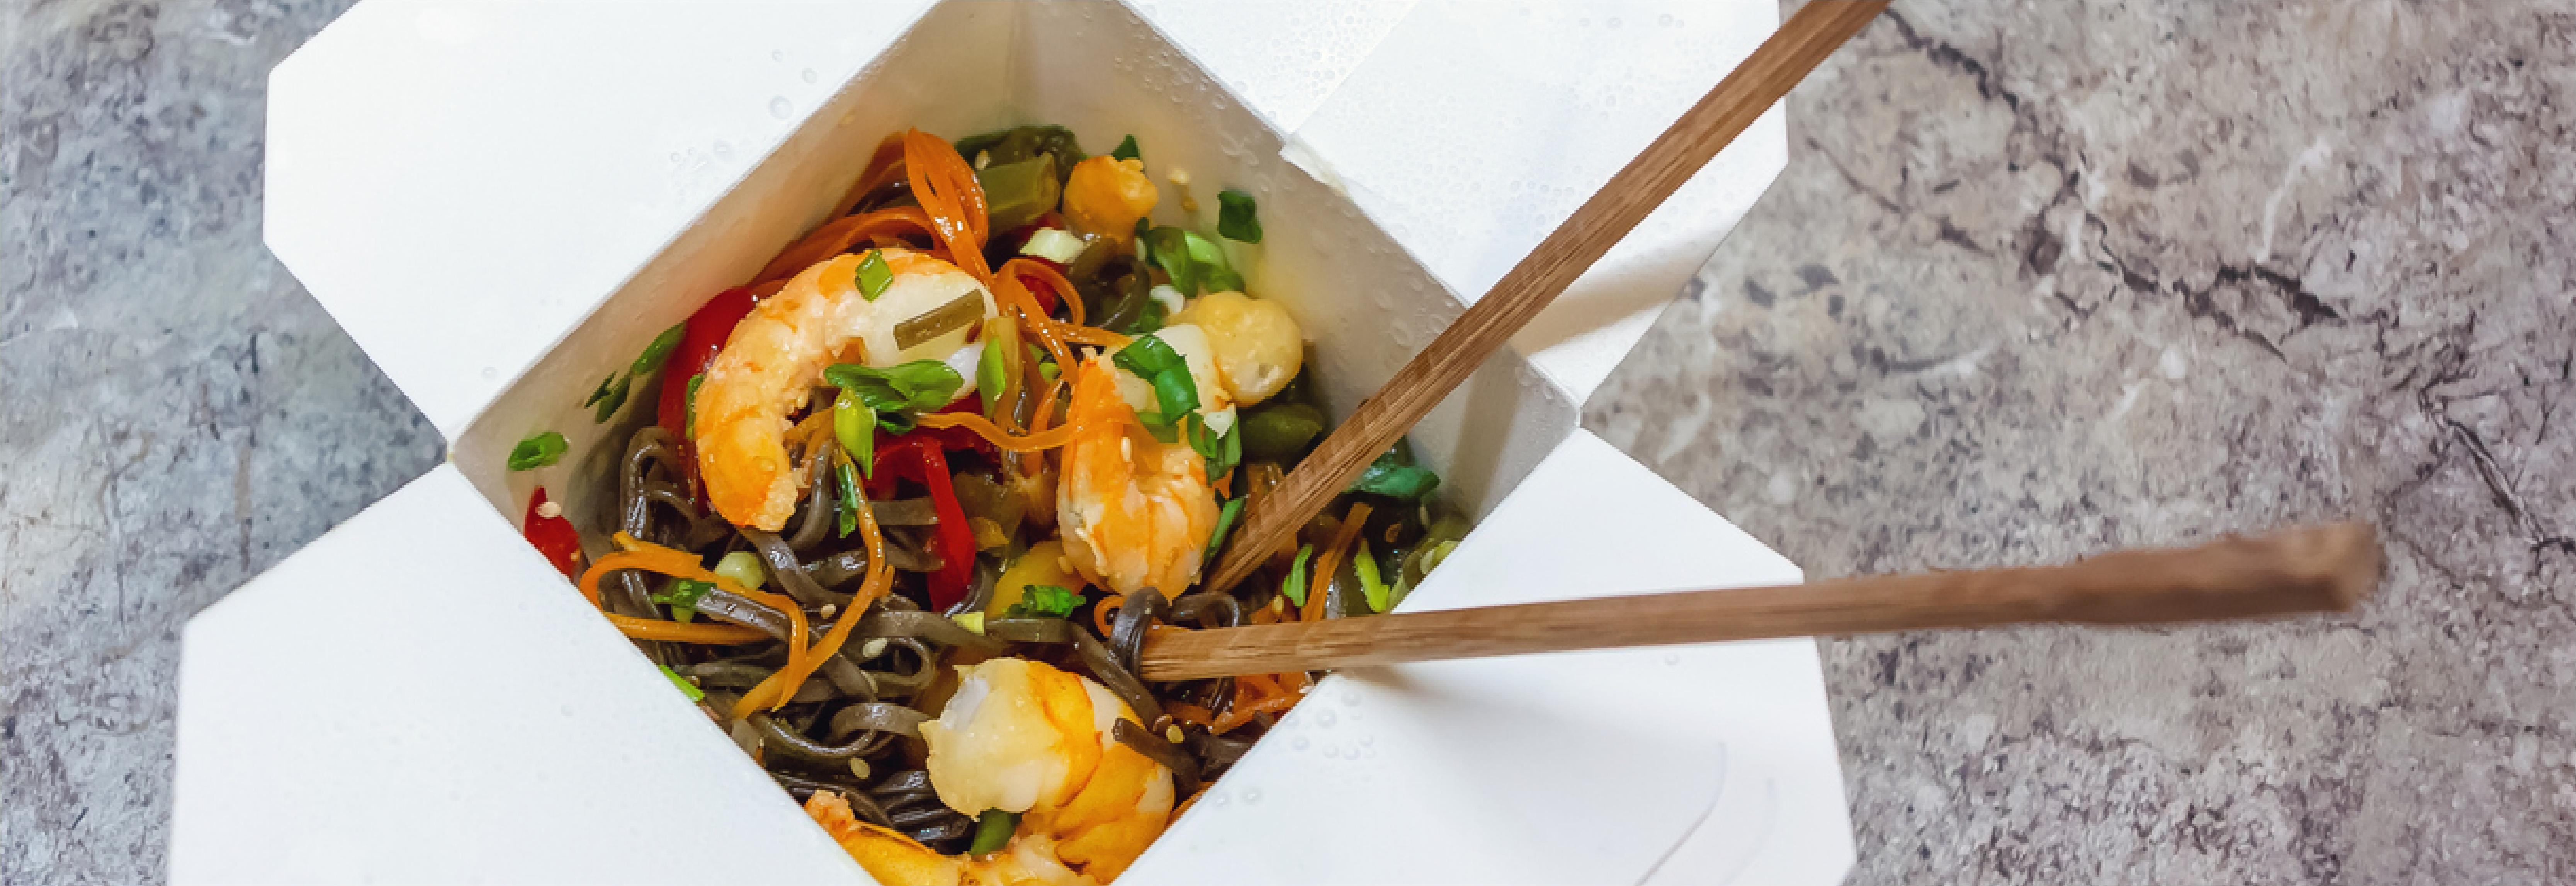 Asian Cuisine near Fort Lee